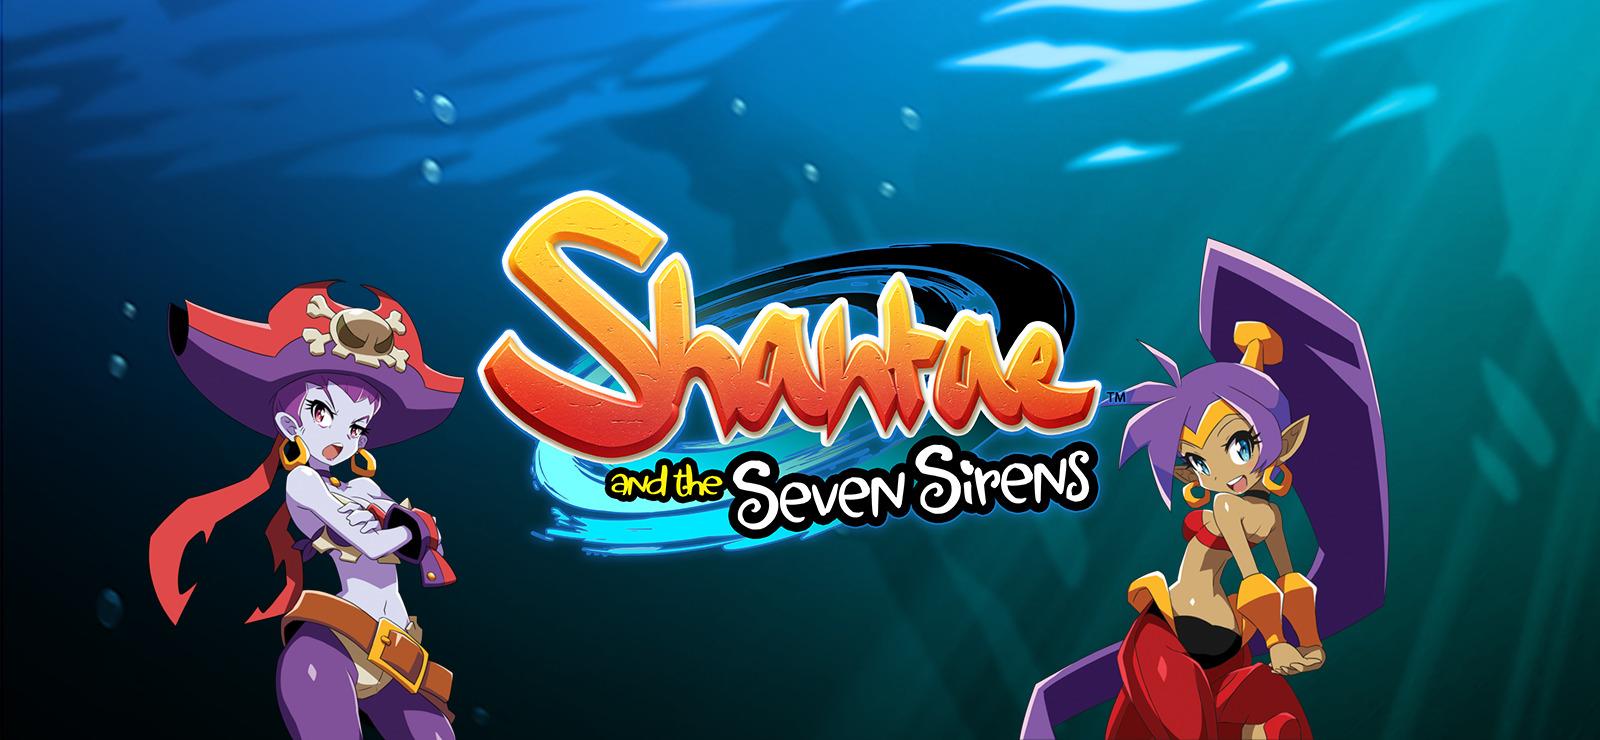 The shantae sirens and seven